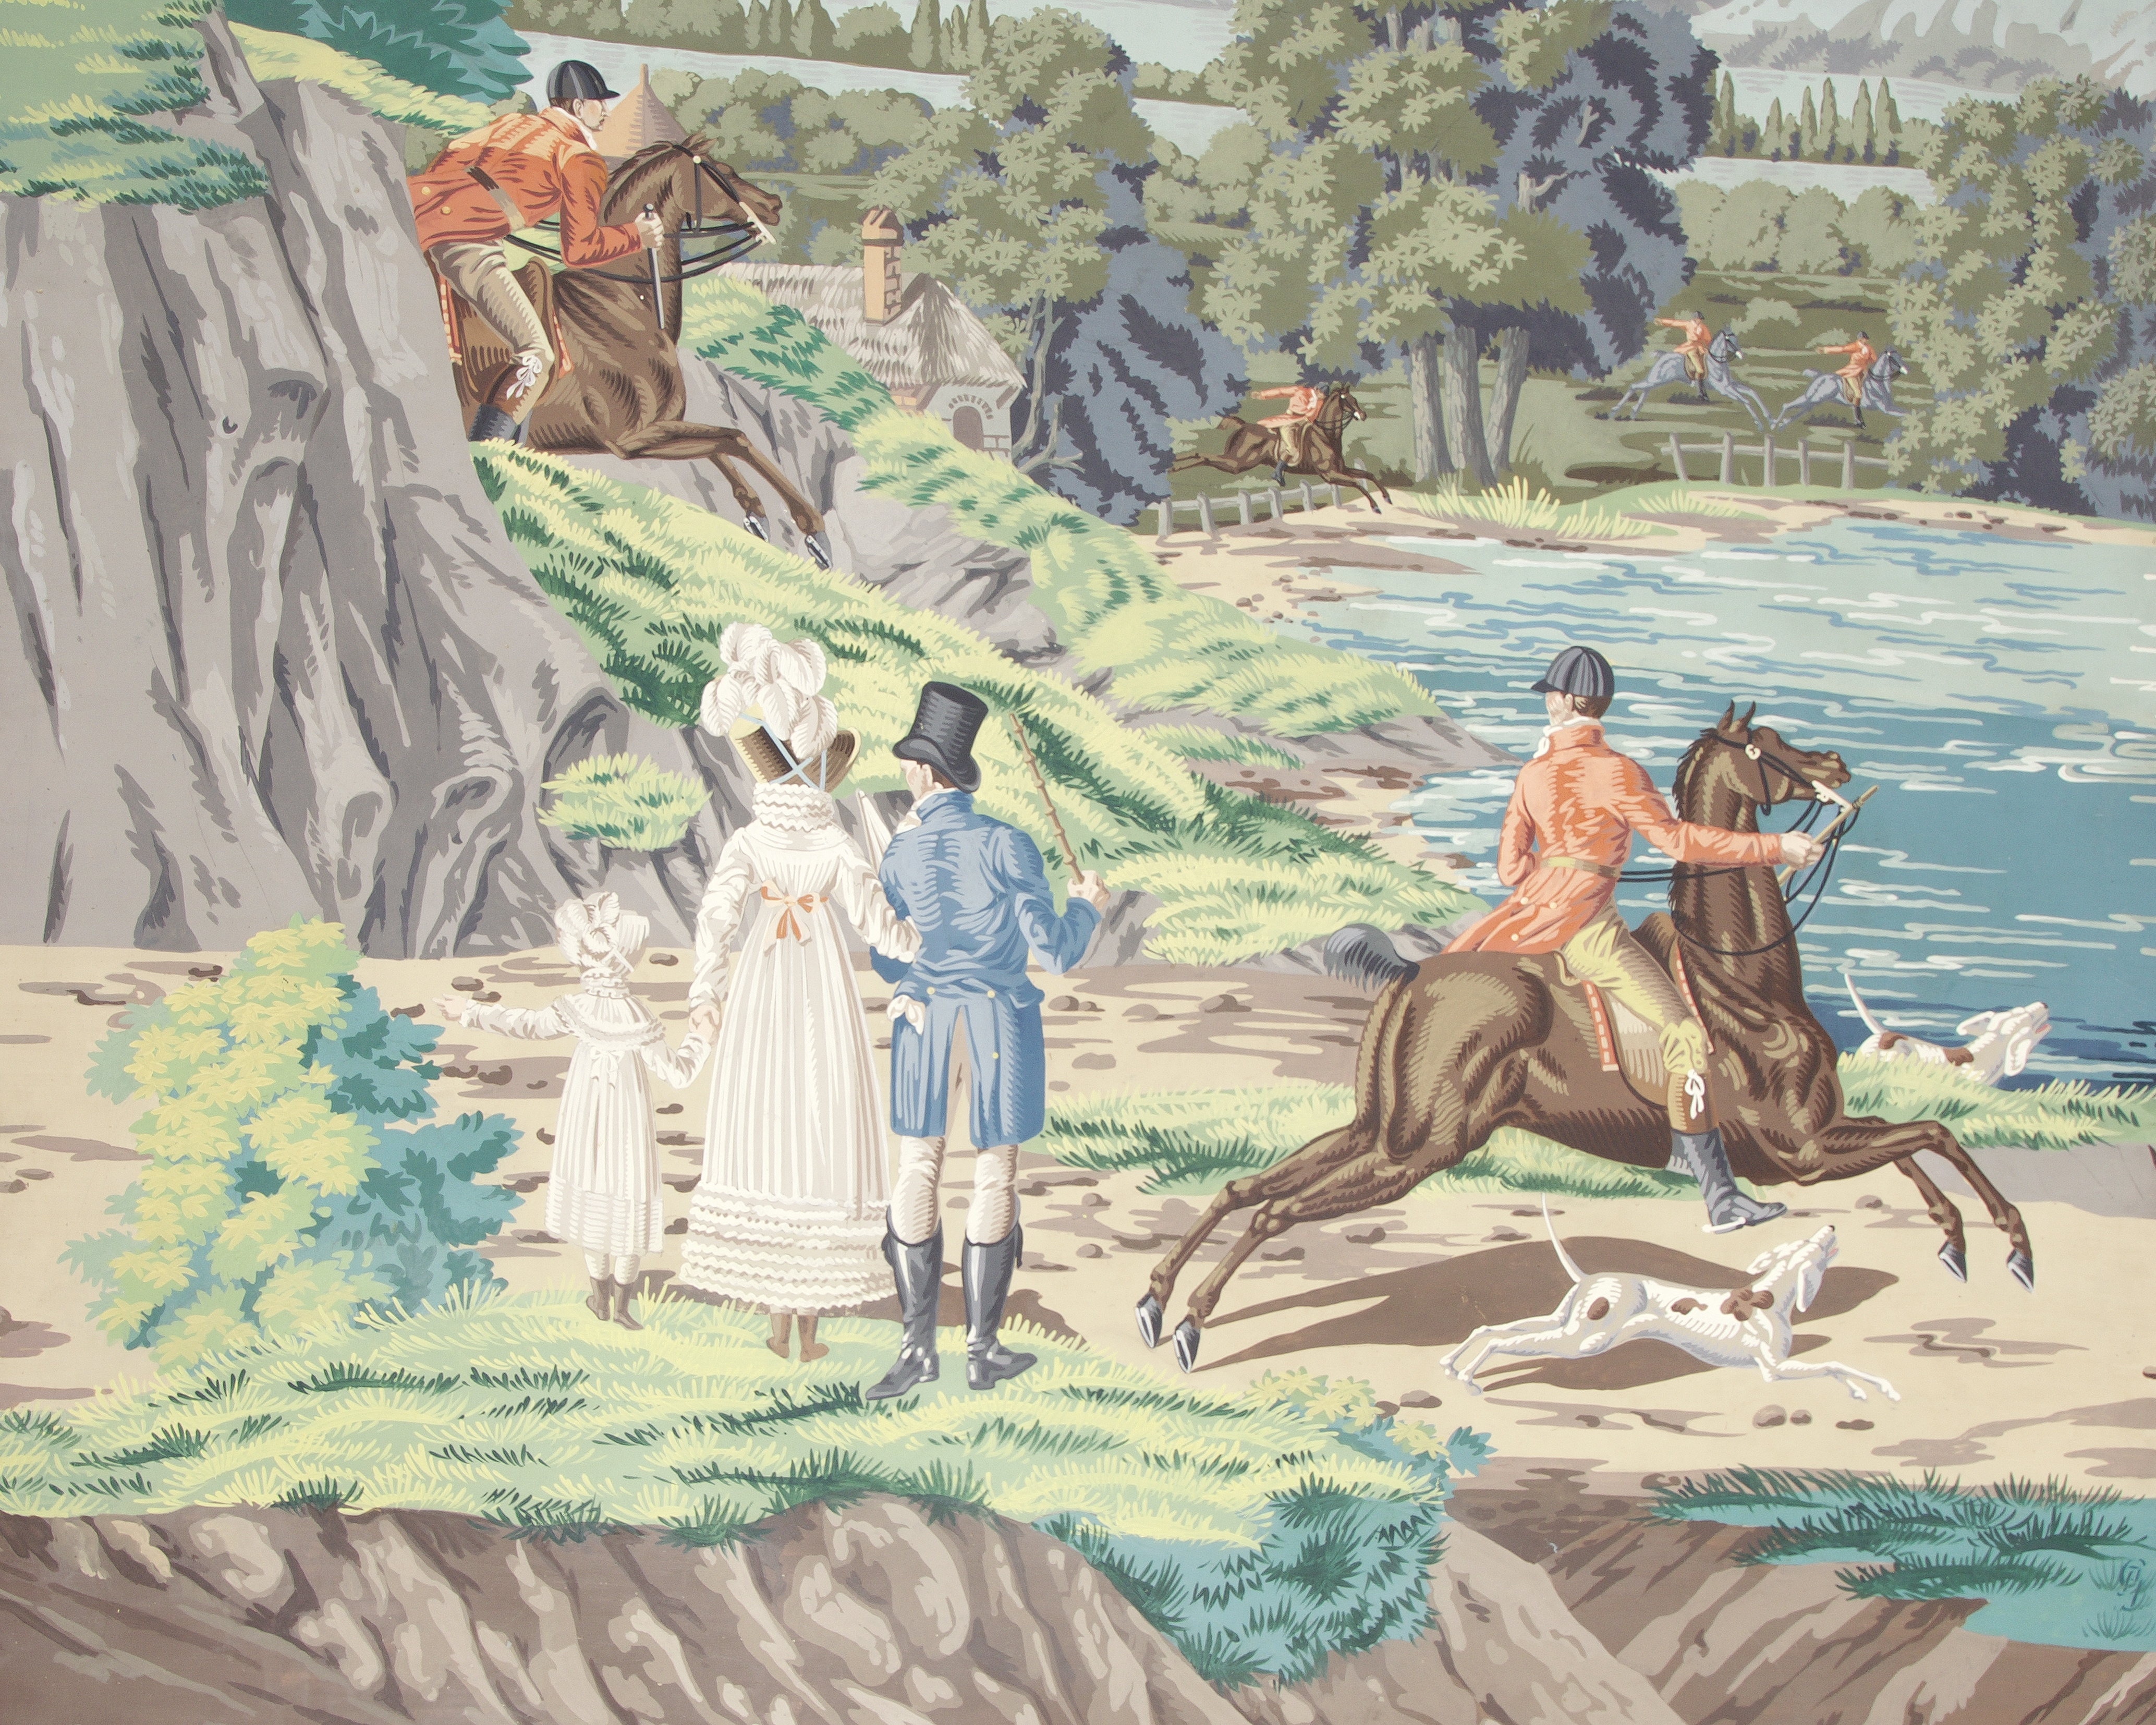 Lot 39 - A set of twelve unusual hand painted 'Les Chasses de Compiegne' panoramic wallpaper panels proba...